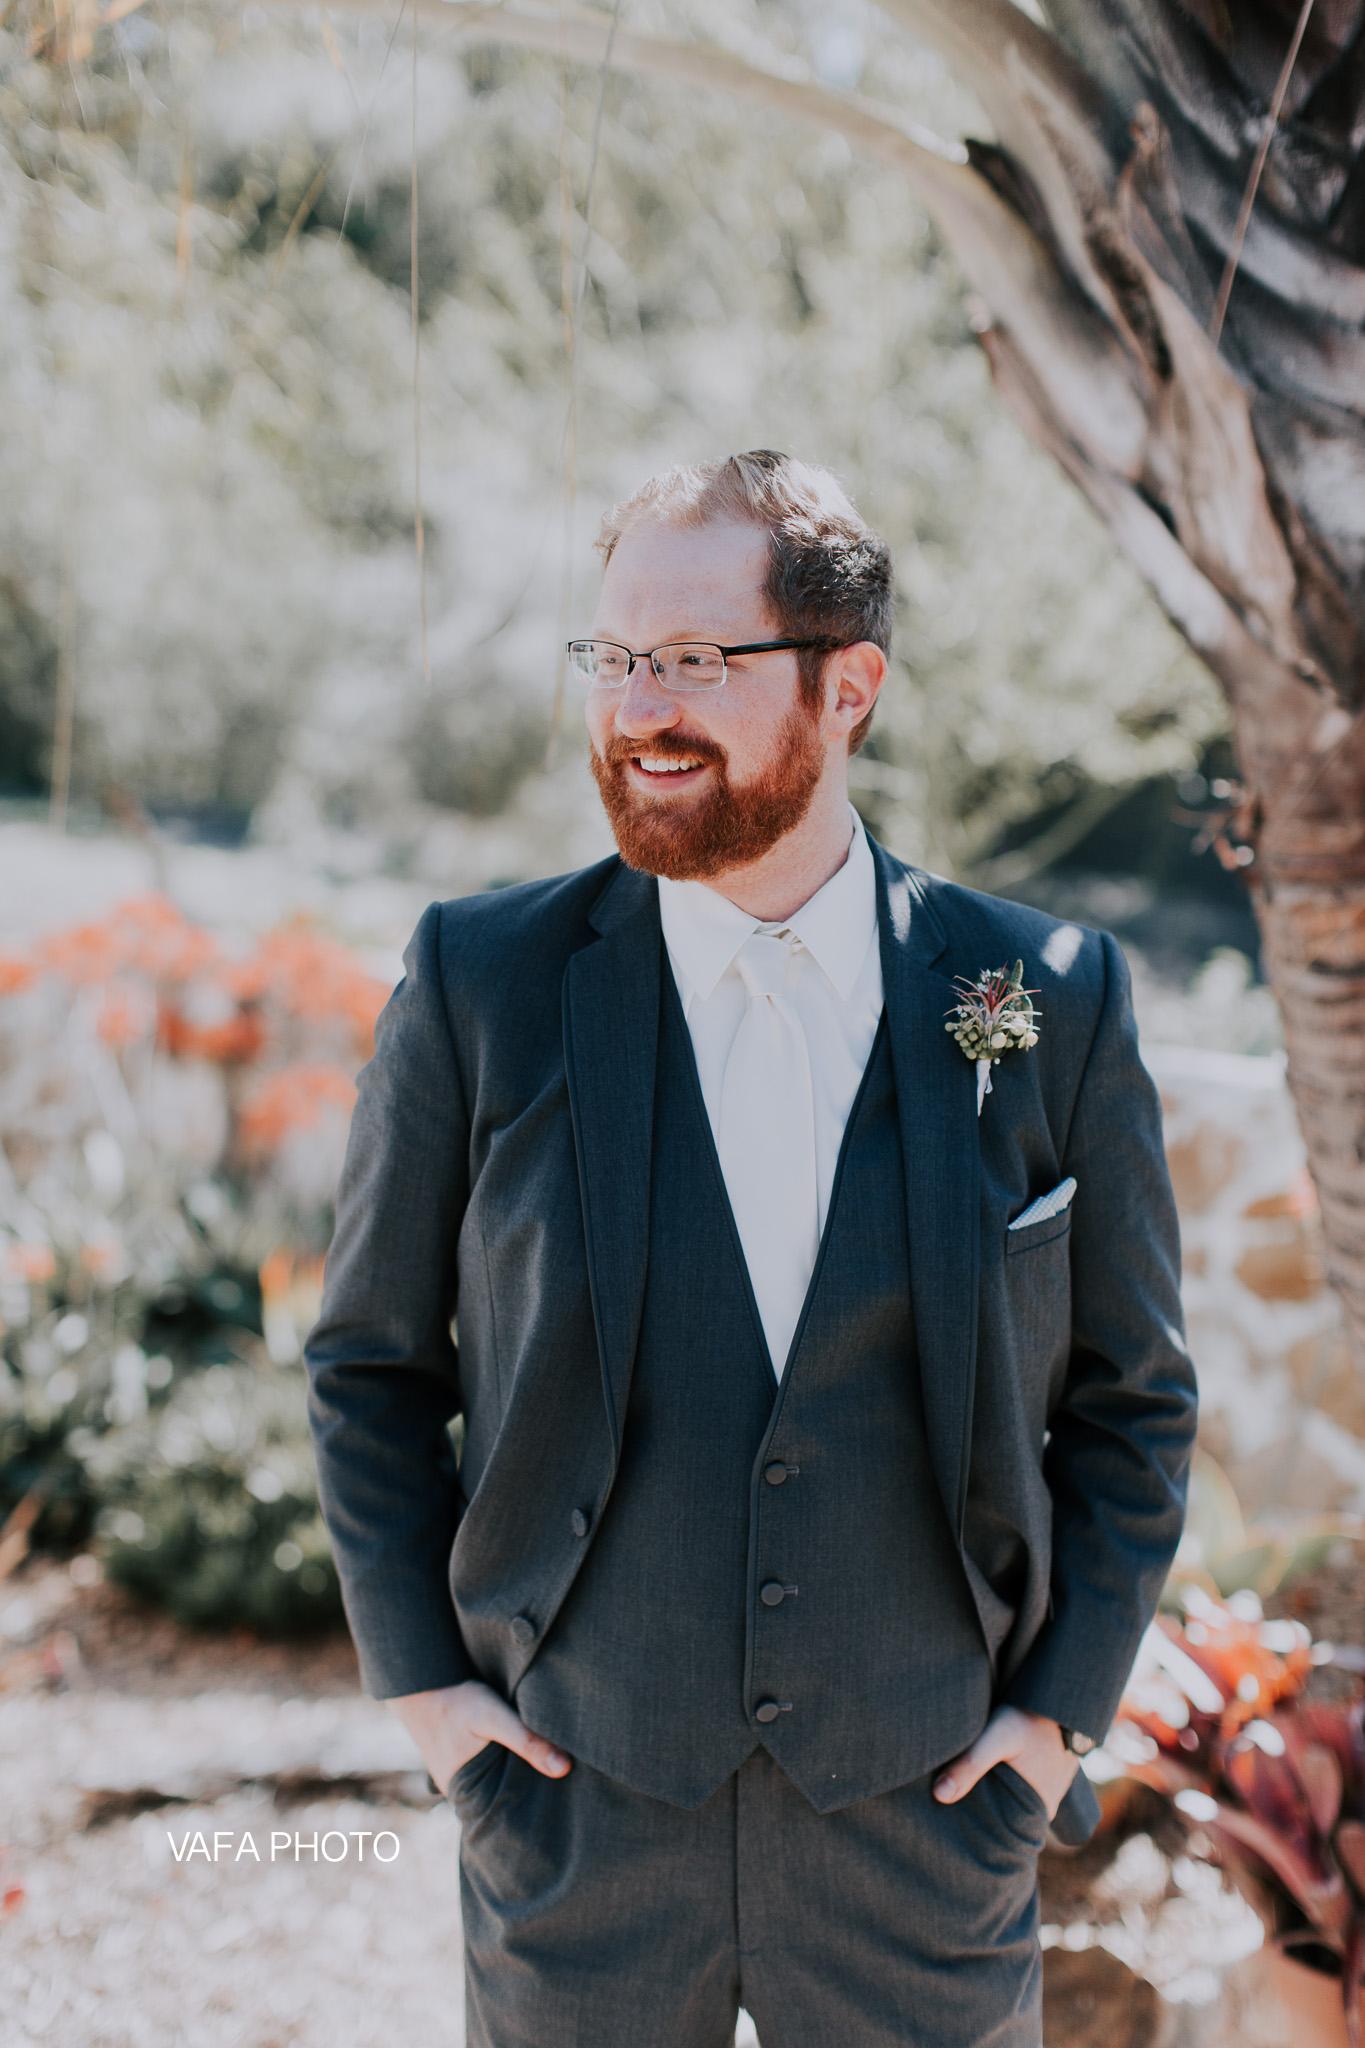 Leo-Carrillo-Ranch-Wedding-Lauren-Mike-Vafa-Photo-347.jpg